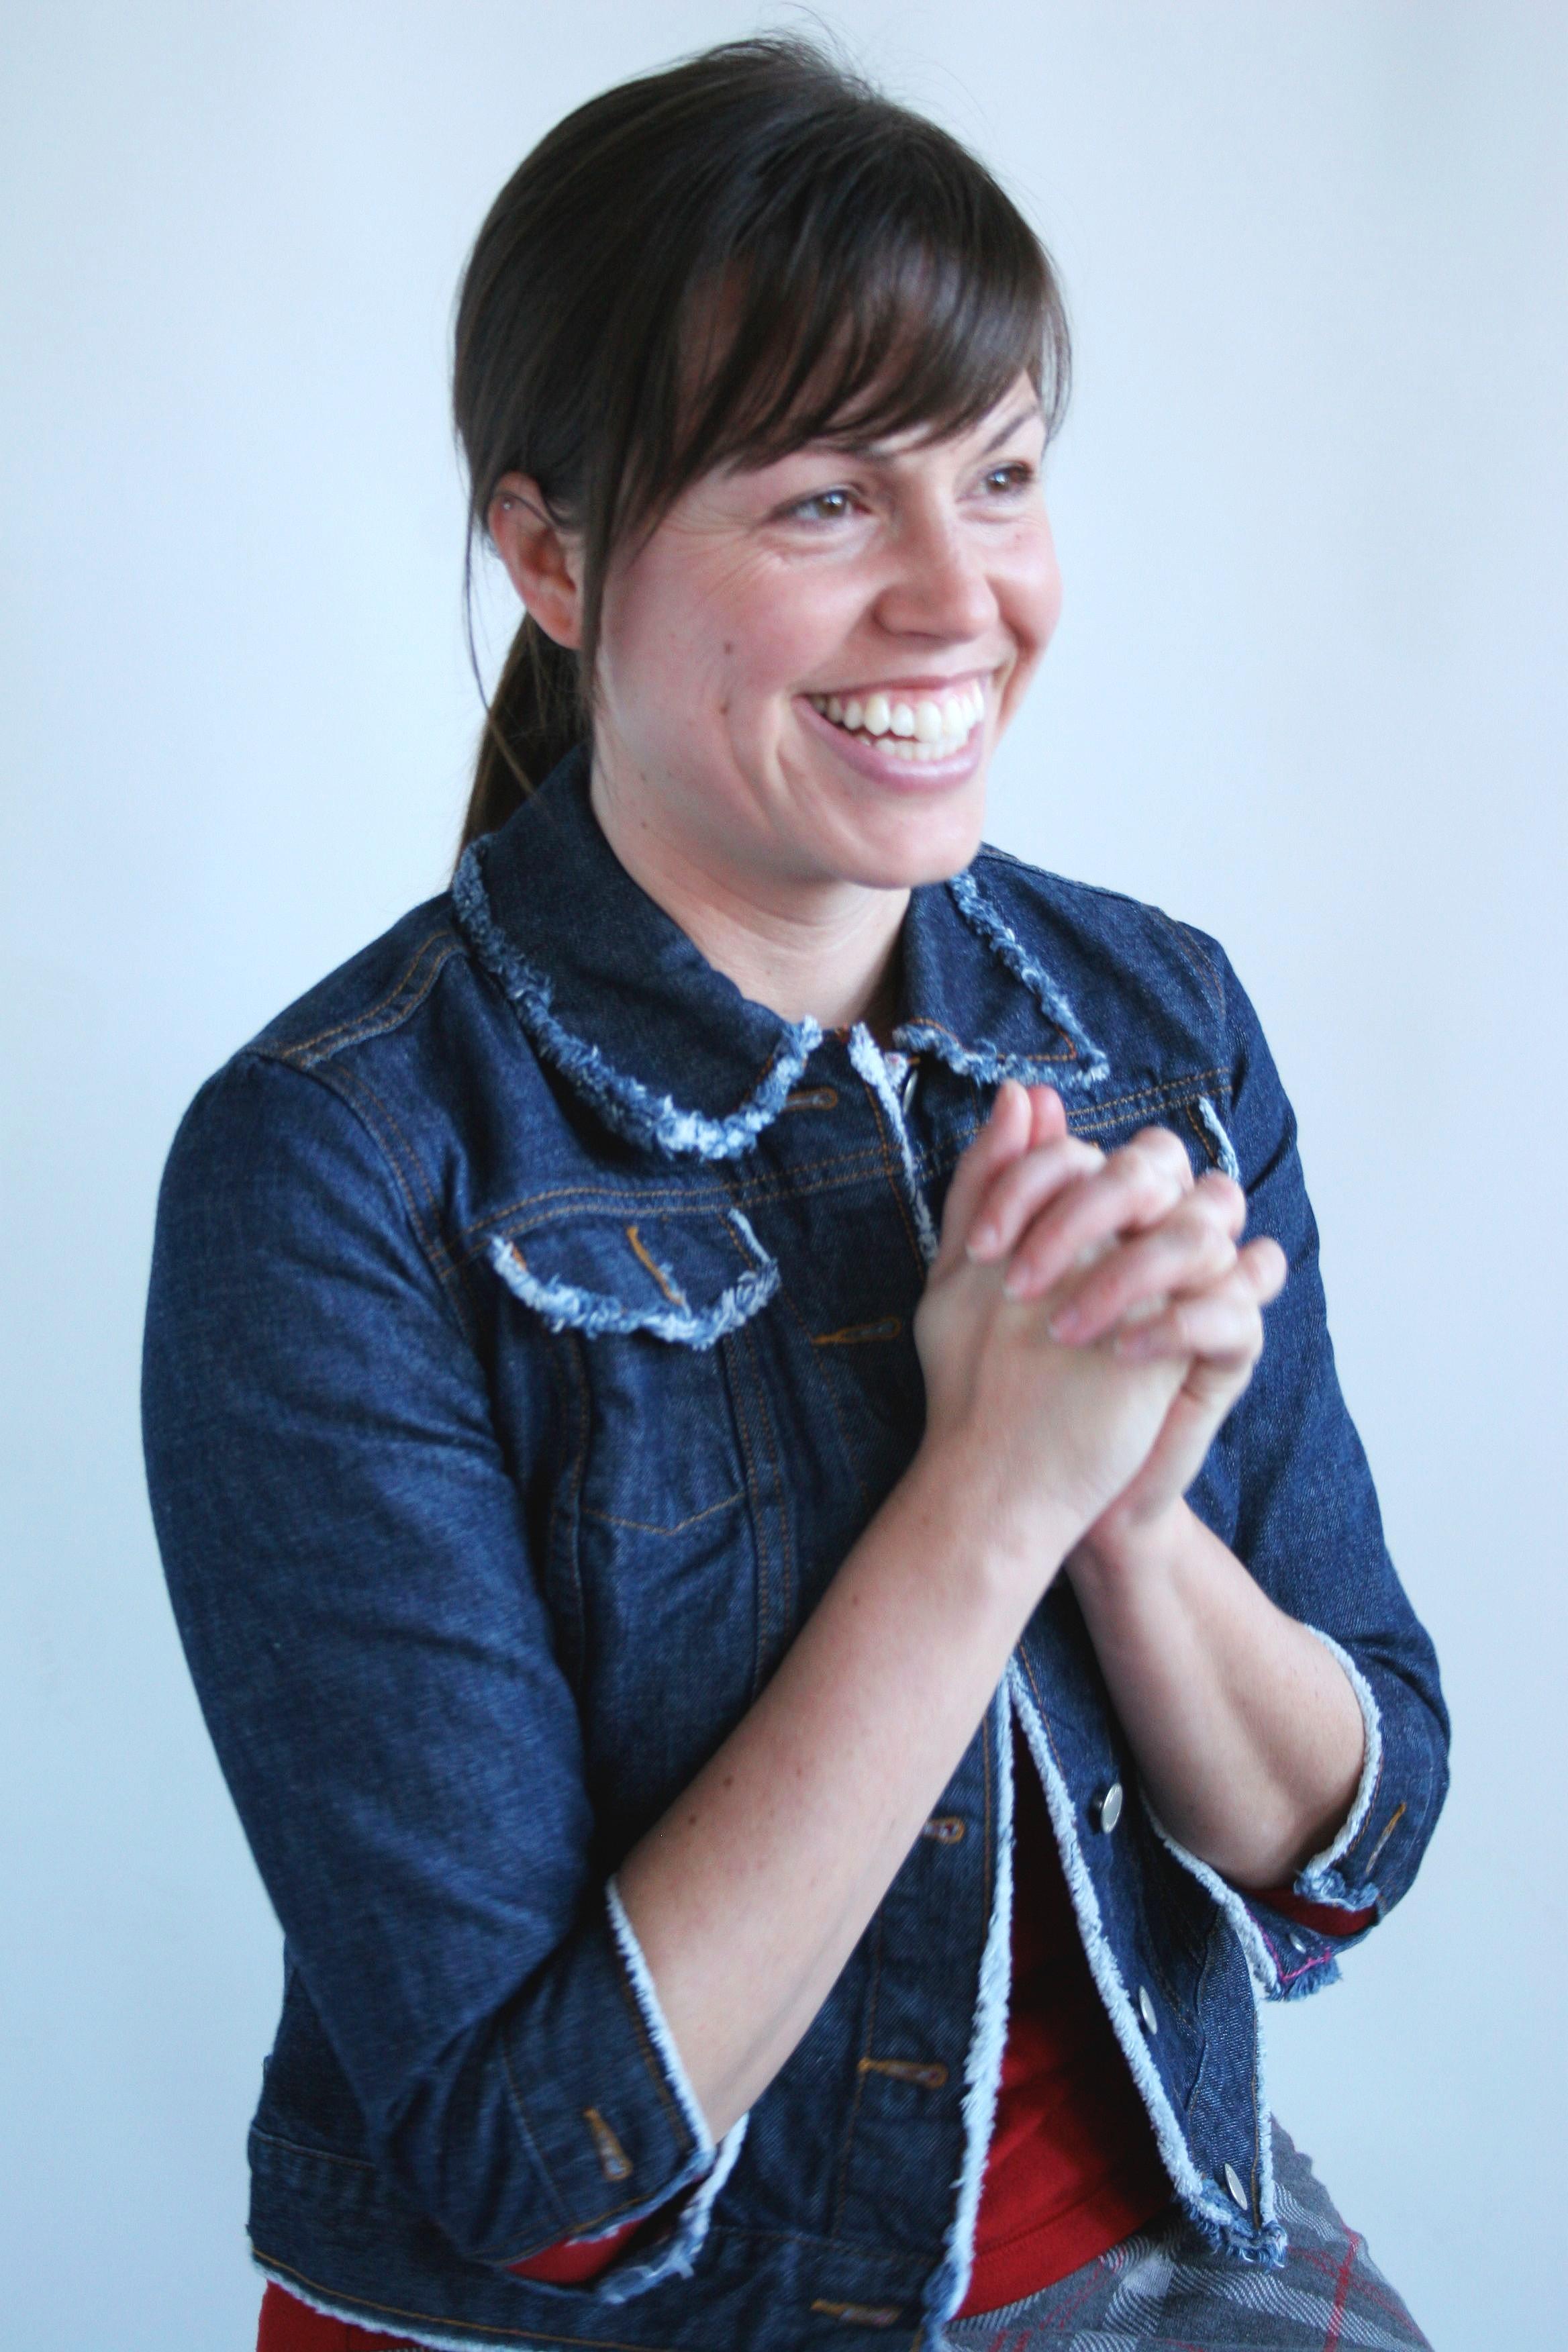 Shana Hartman, Ph.D., LMBT